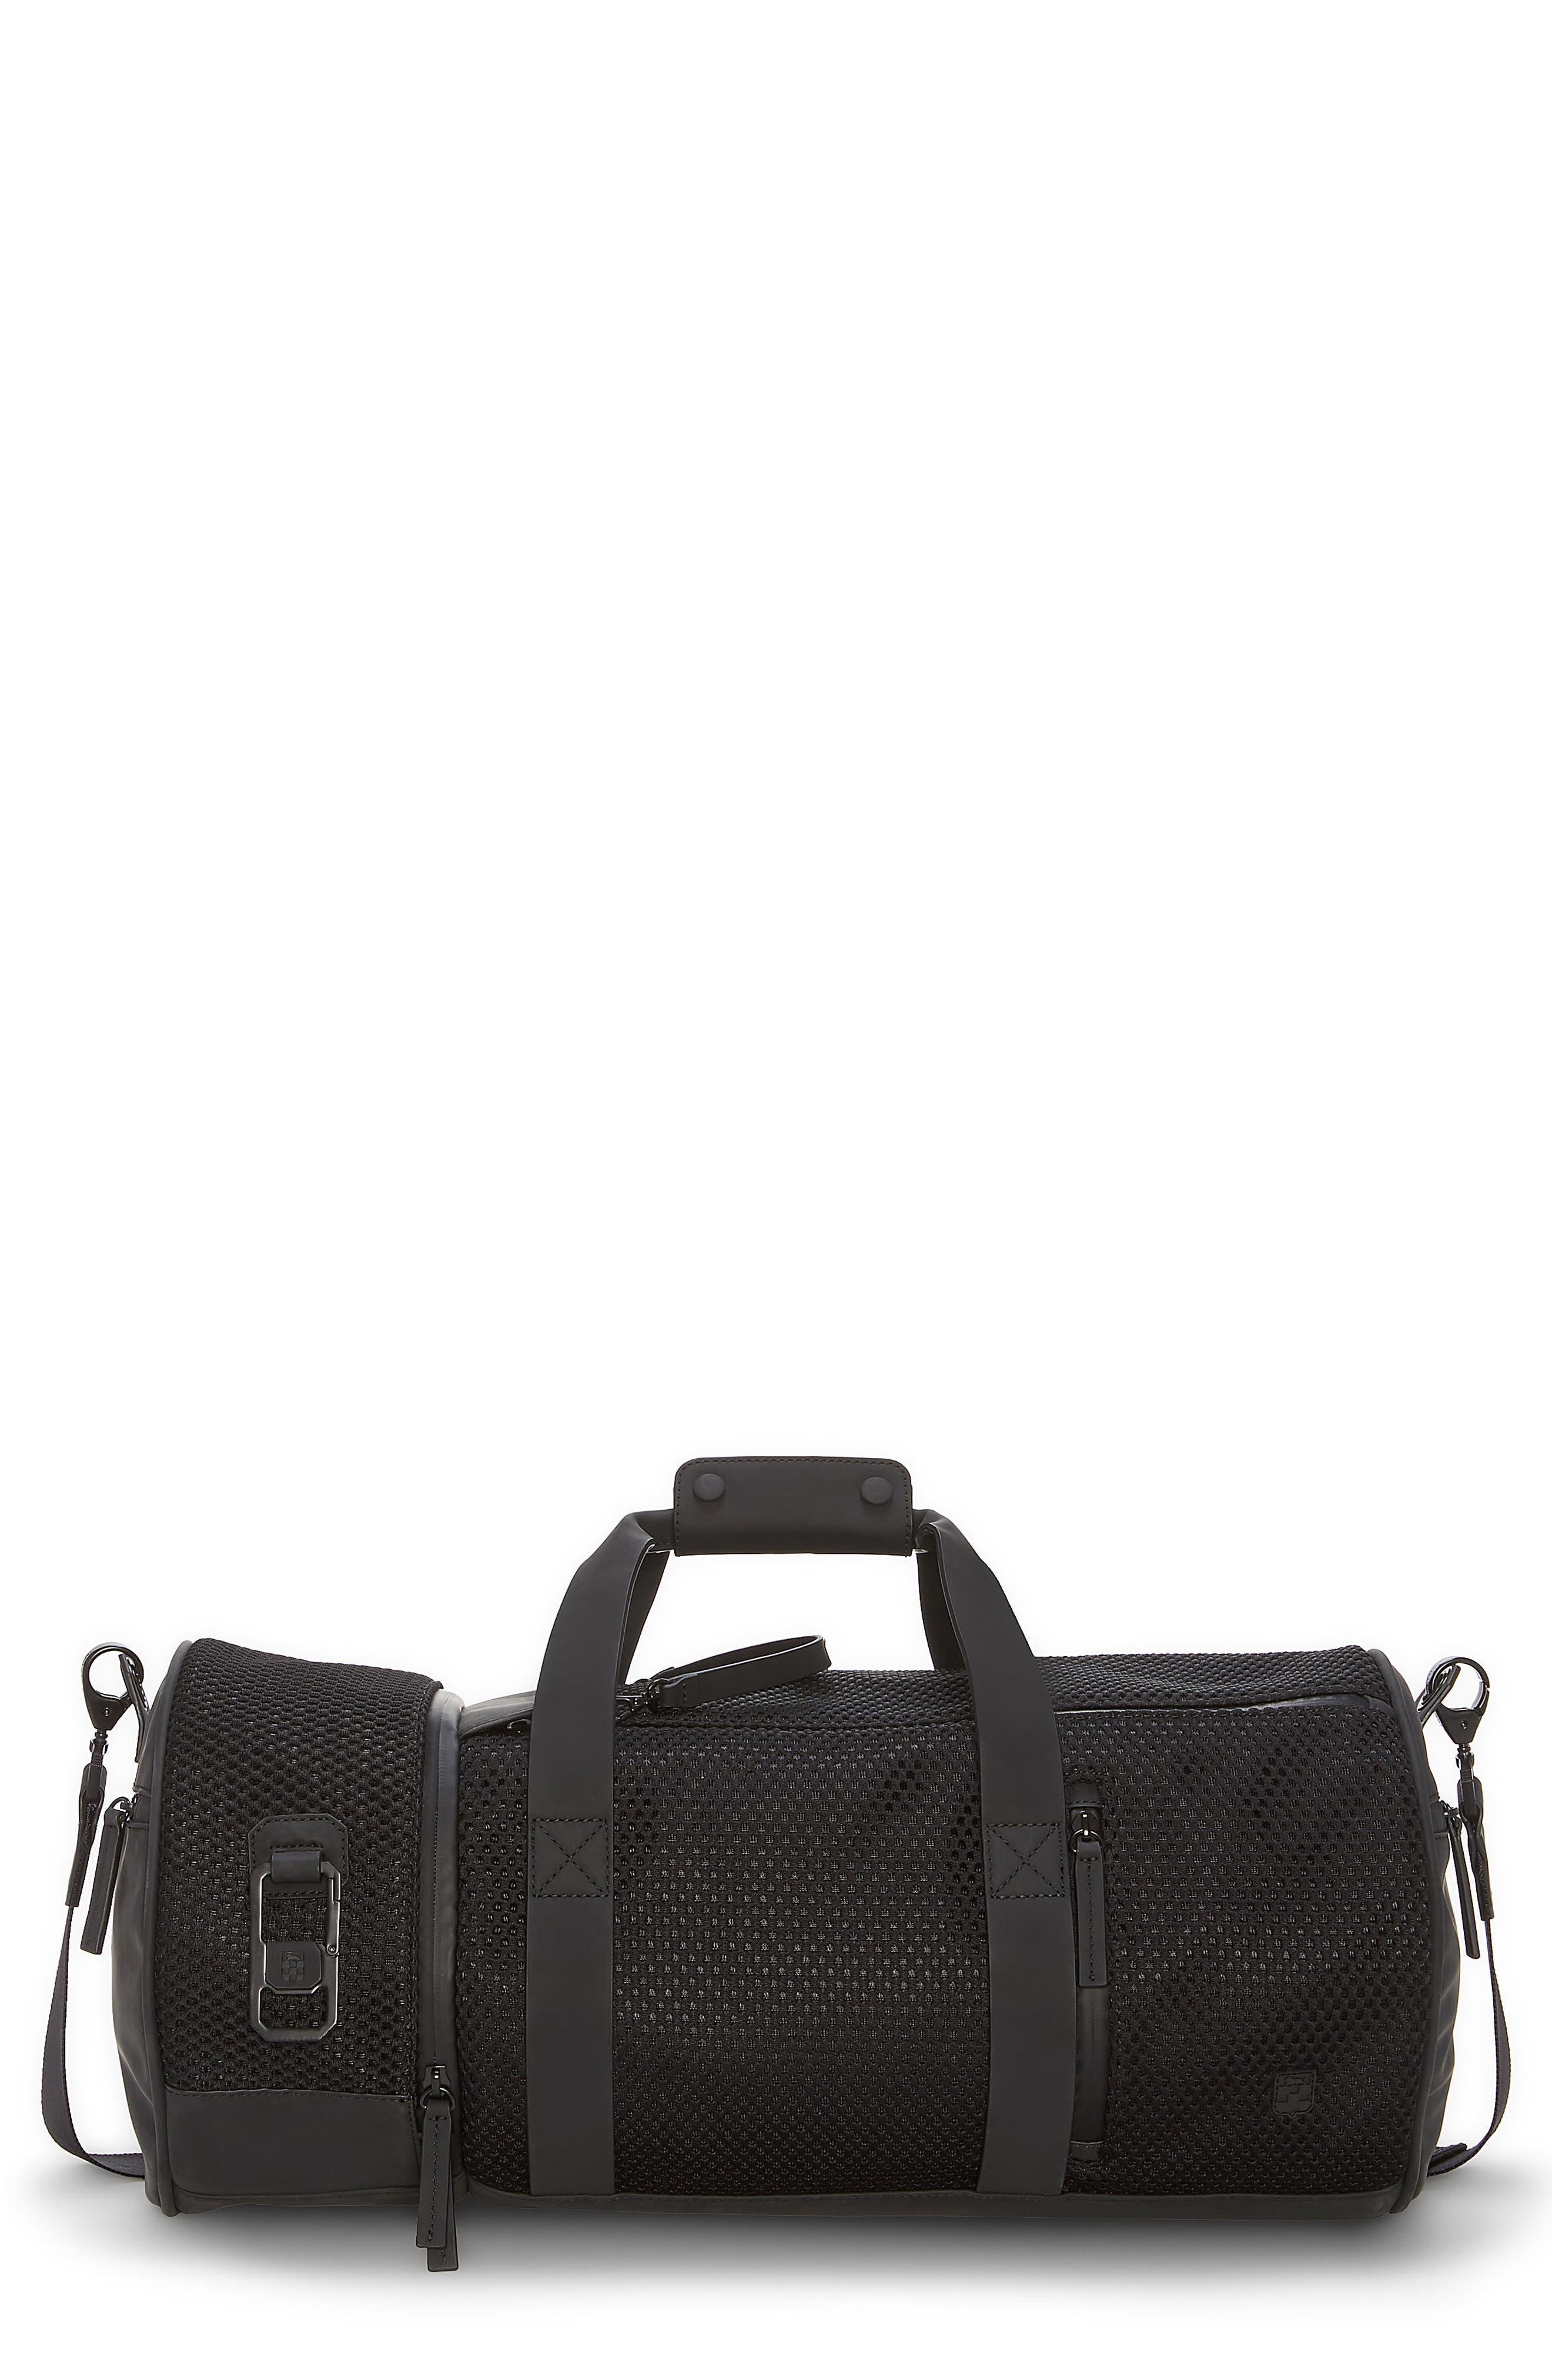 Urban Mesh Duffel Bag,                             Main thumbnail 1, color,                             002